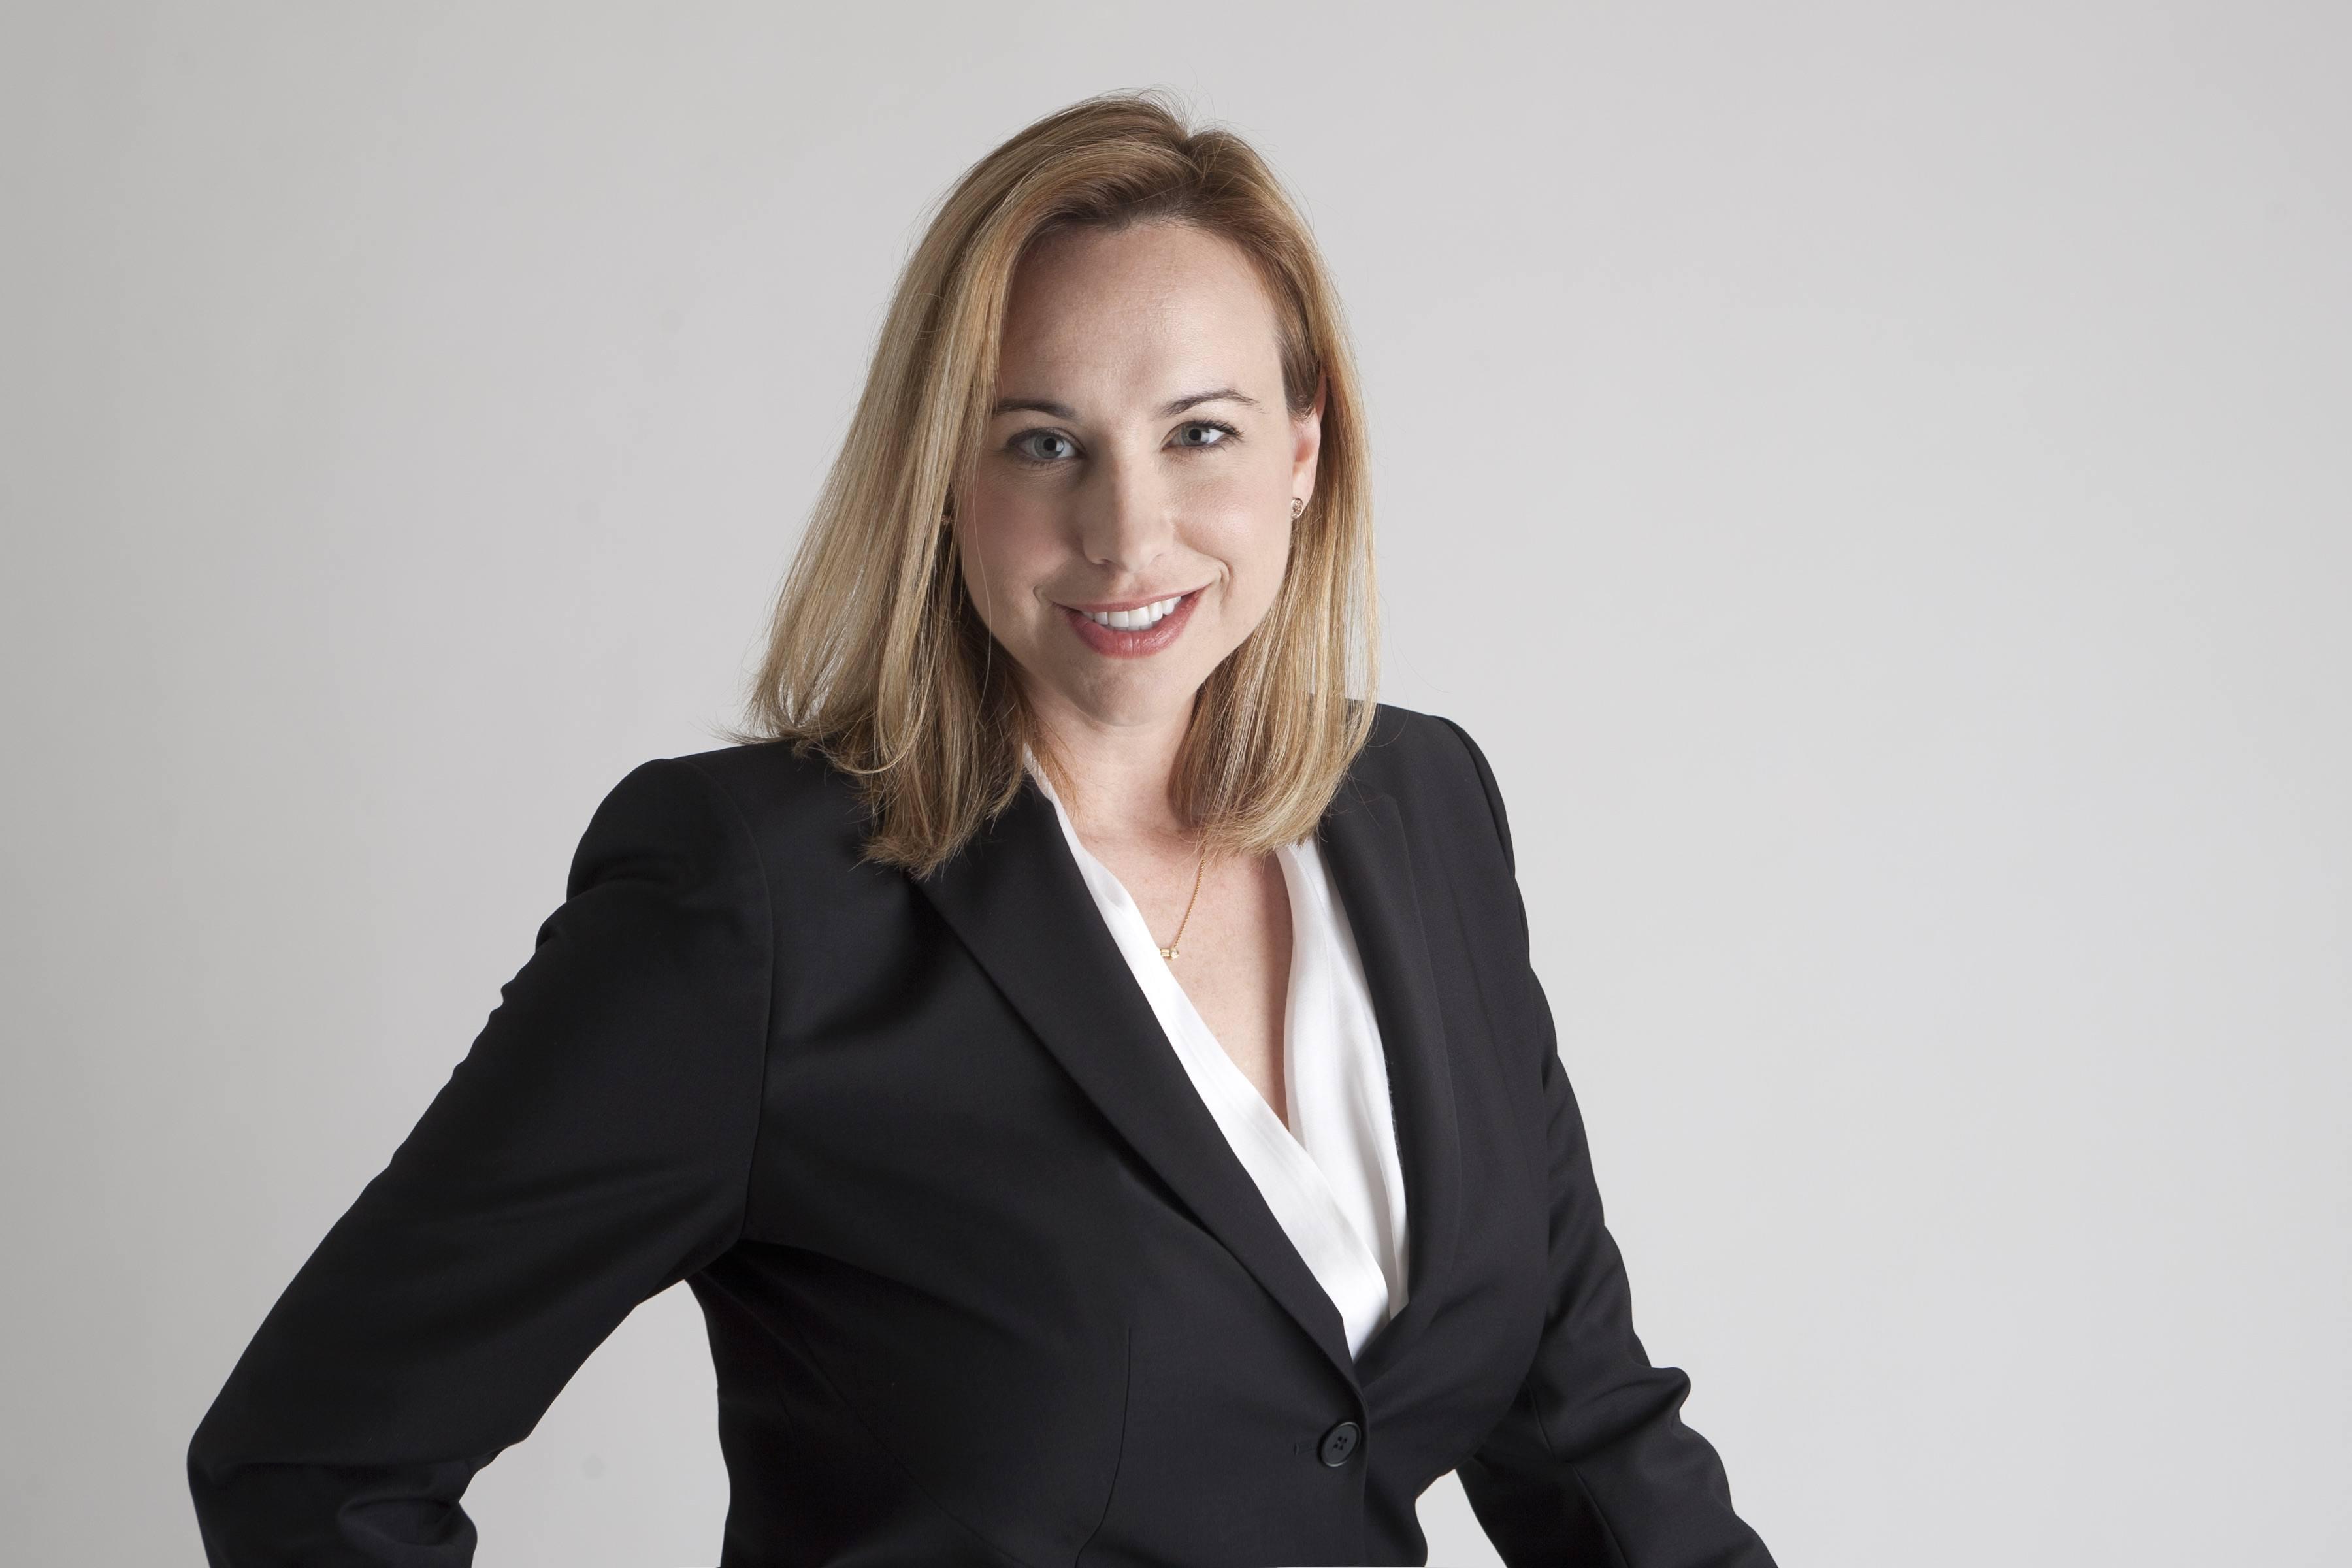 Meredith Levine